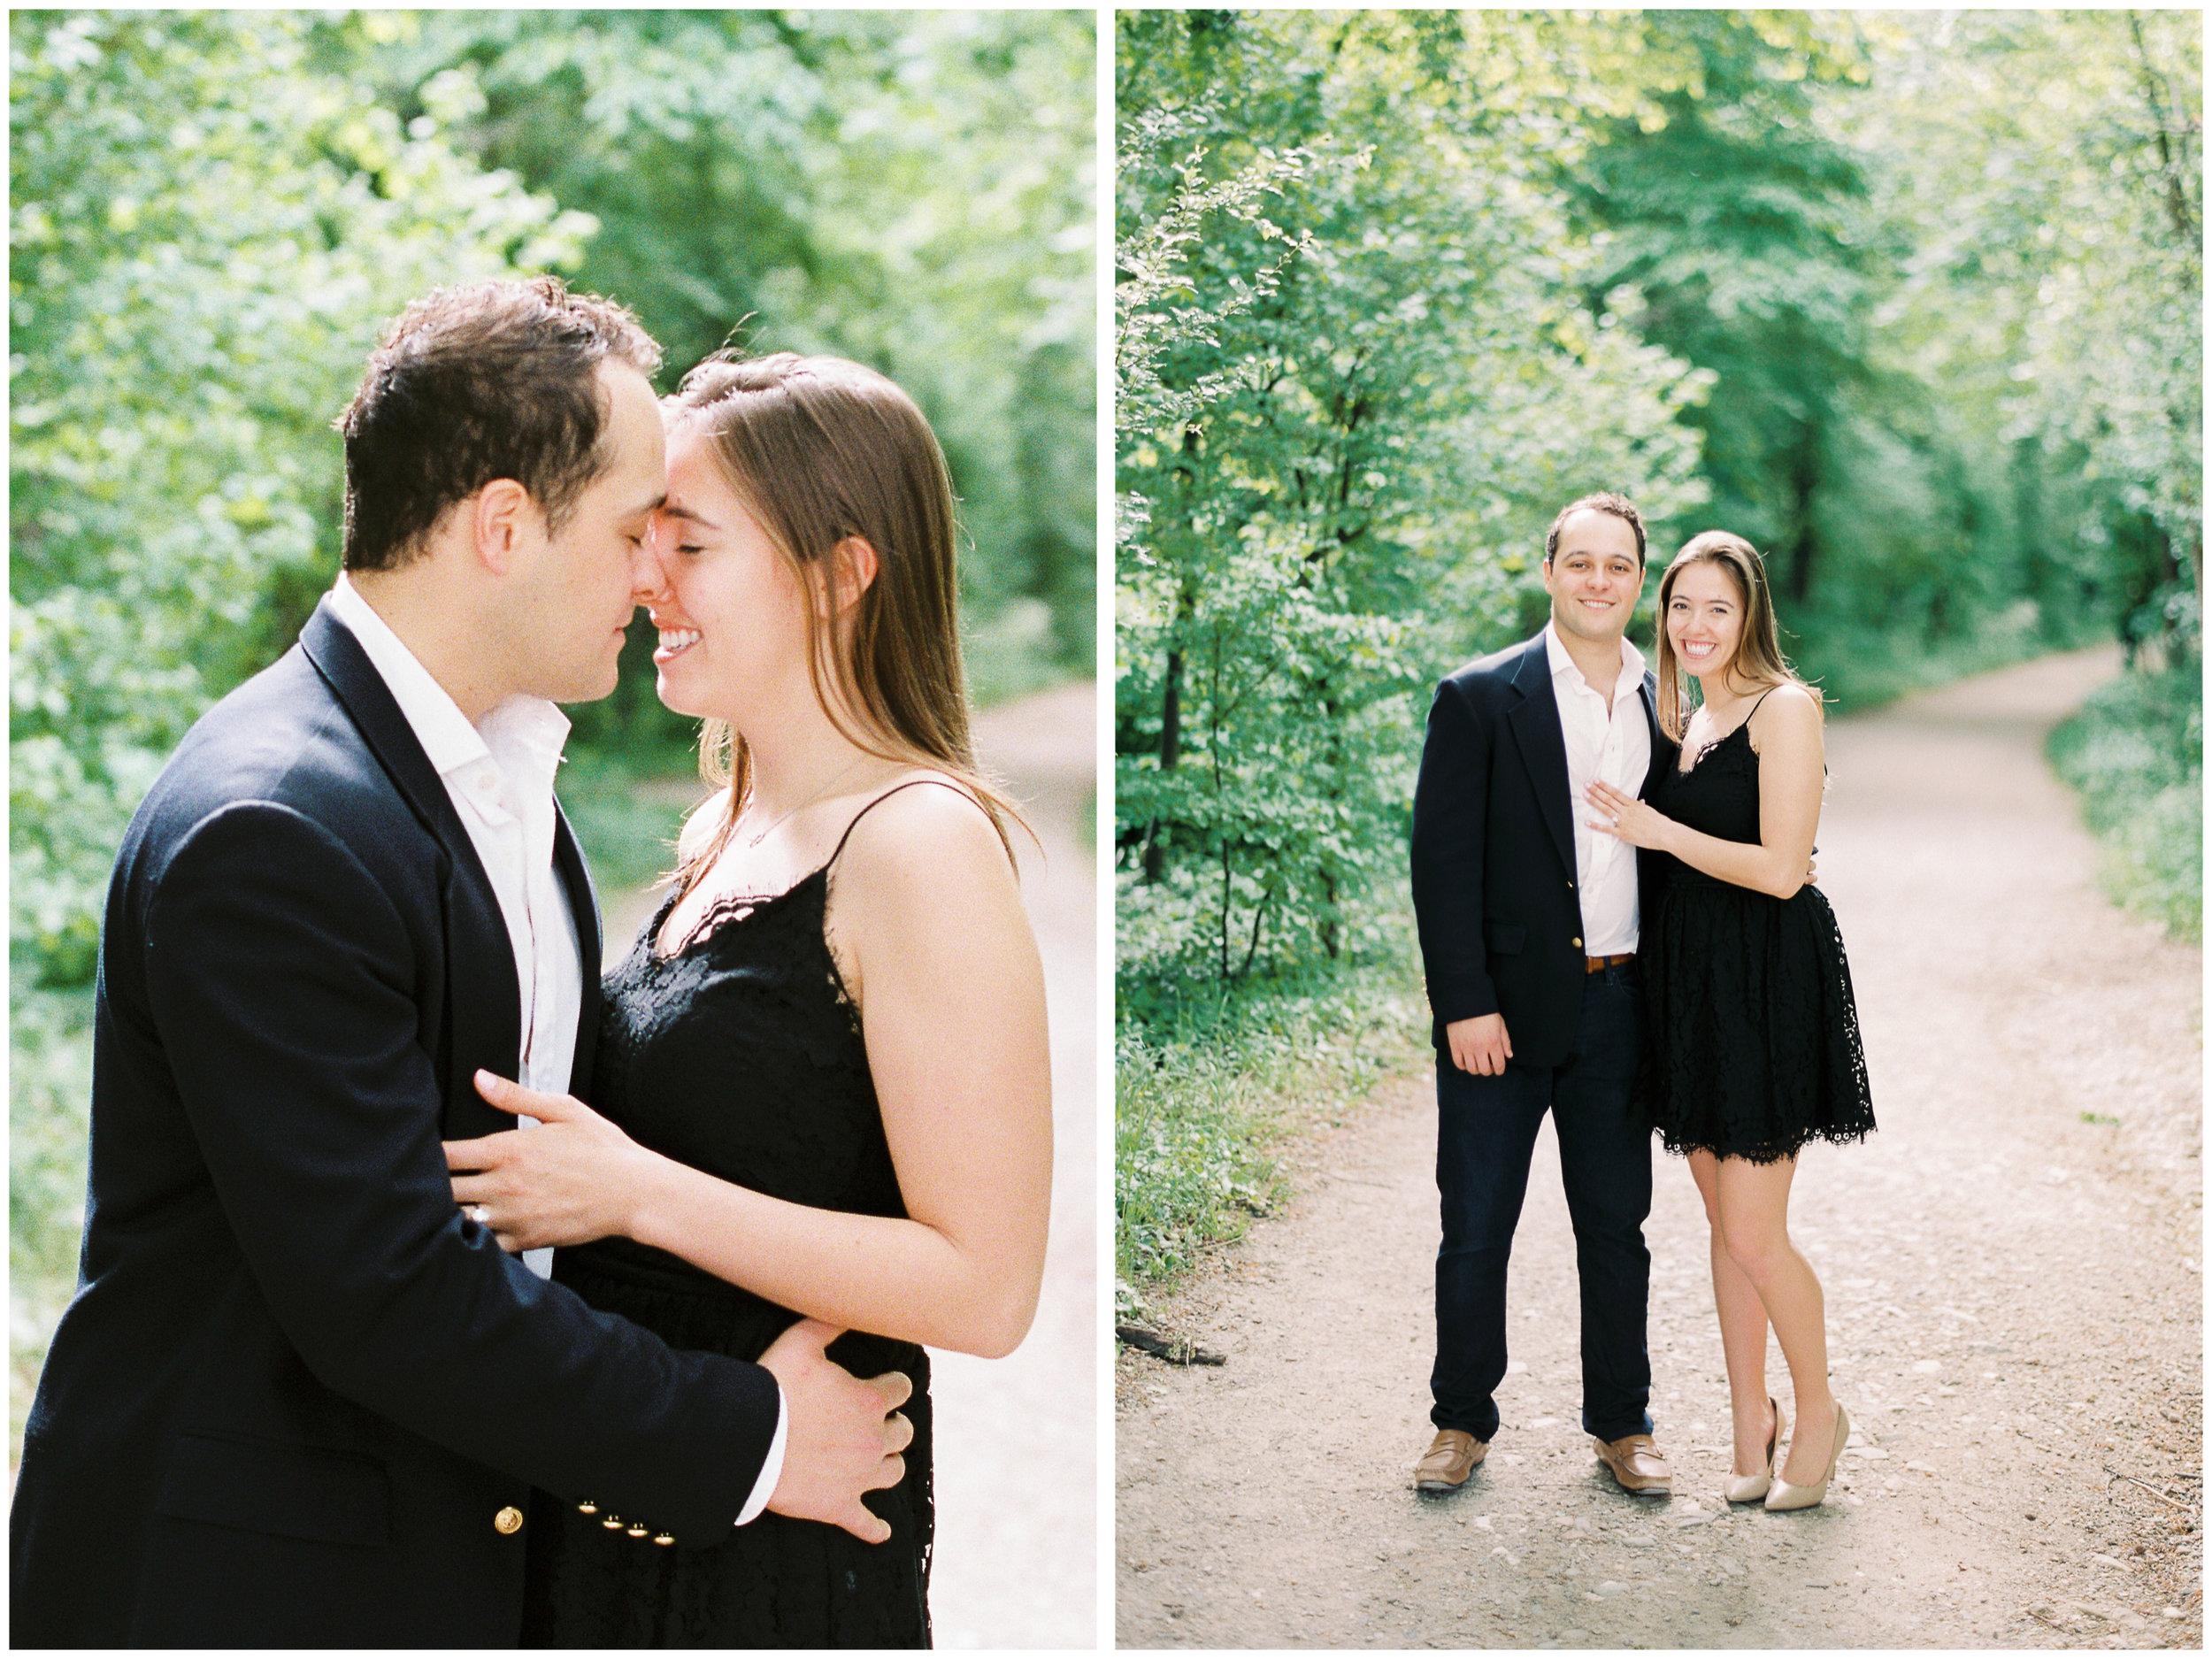 Secret Engagement Session | The Gloriette, Vienna | Michelle Mock Photography | Film Photographer | Contax 645 | Fuji400H